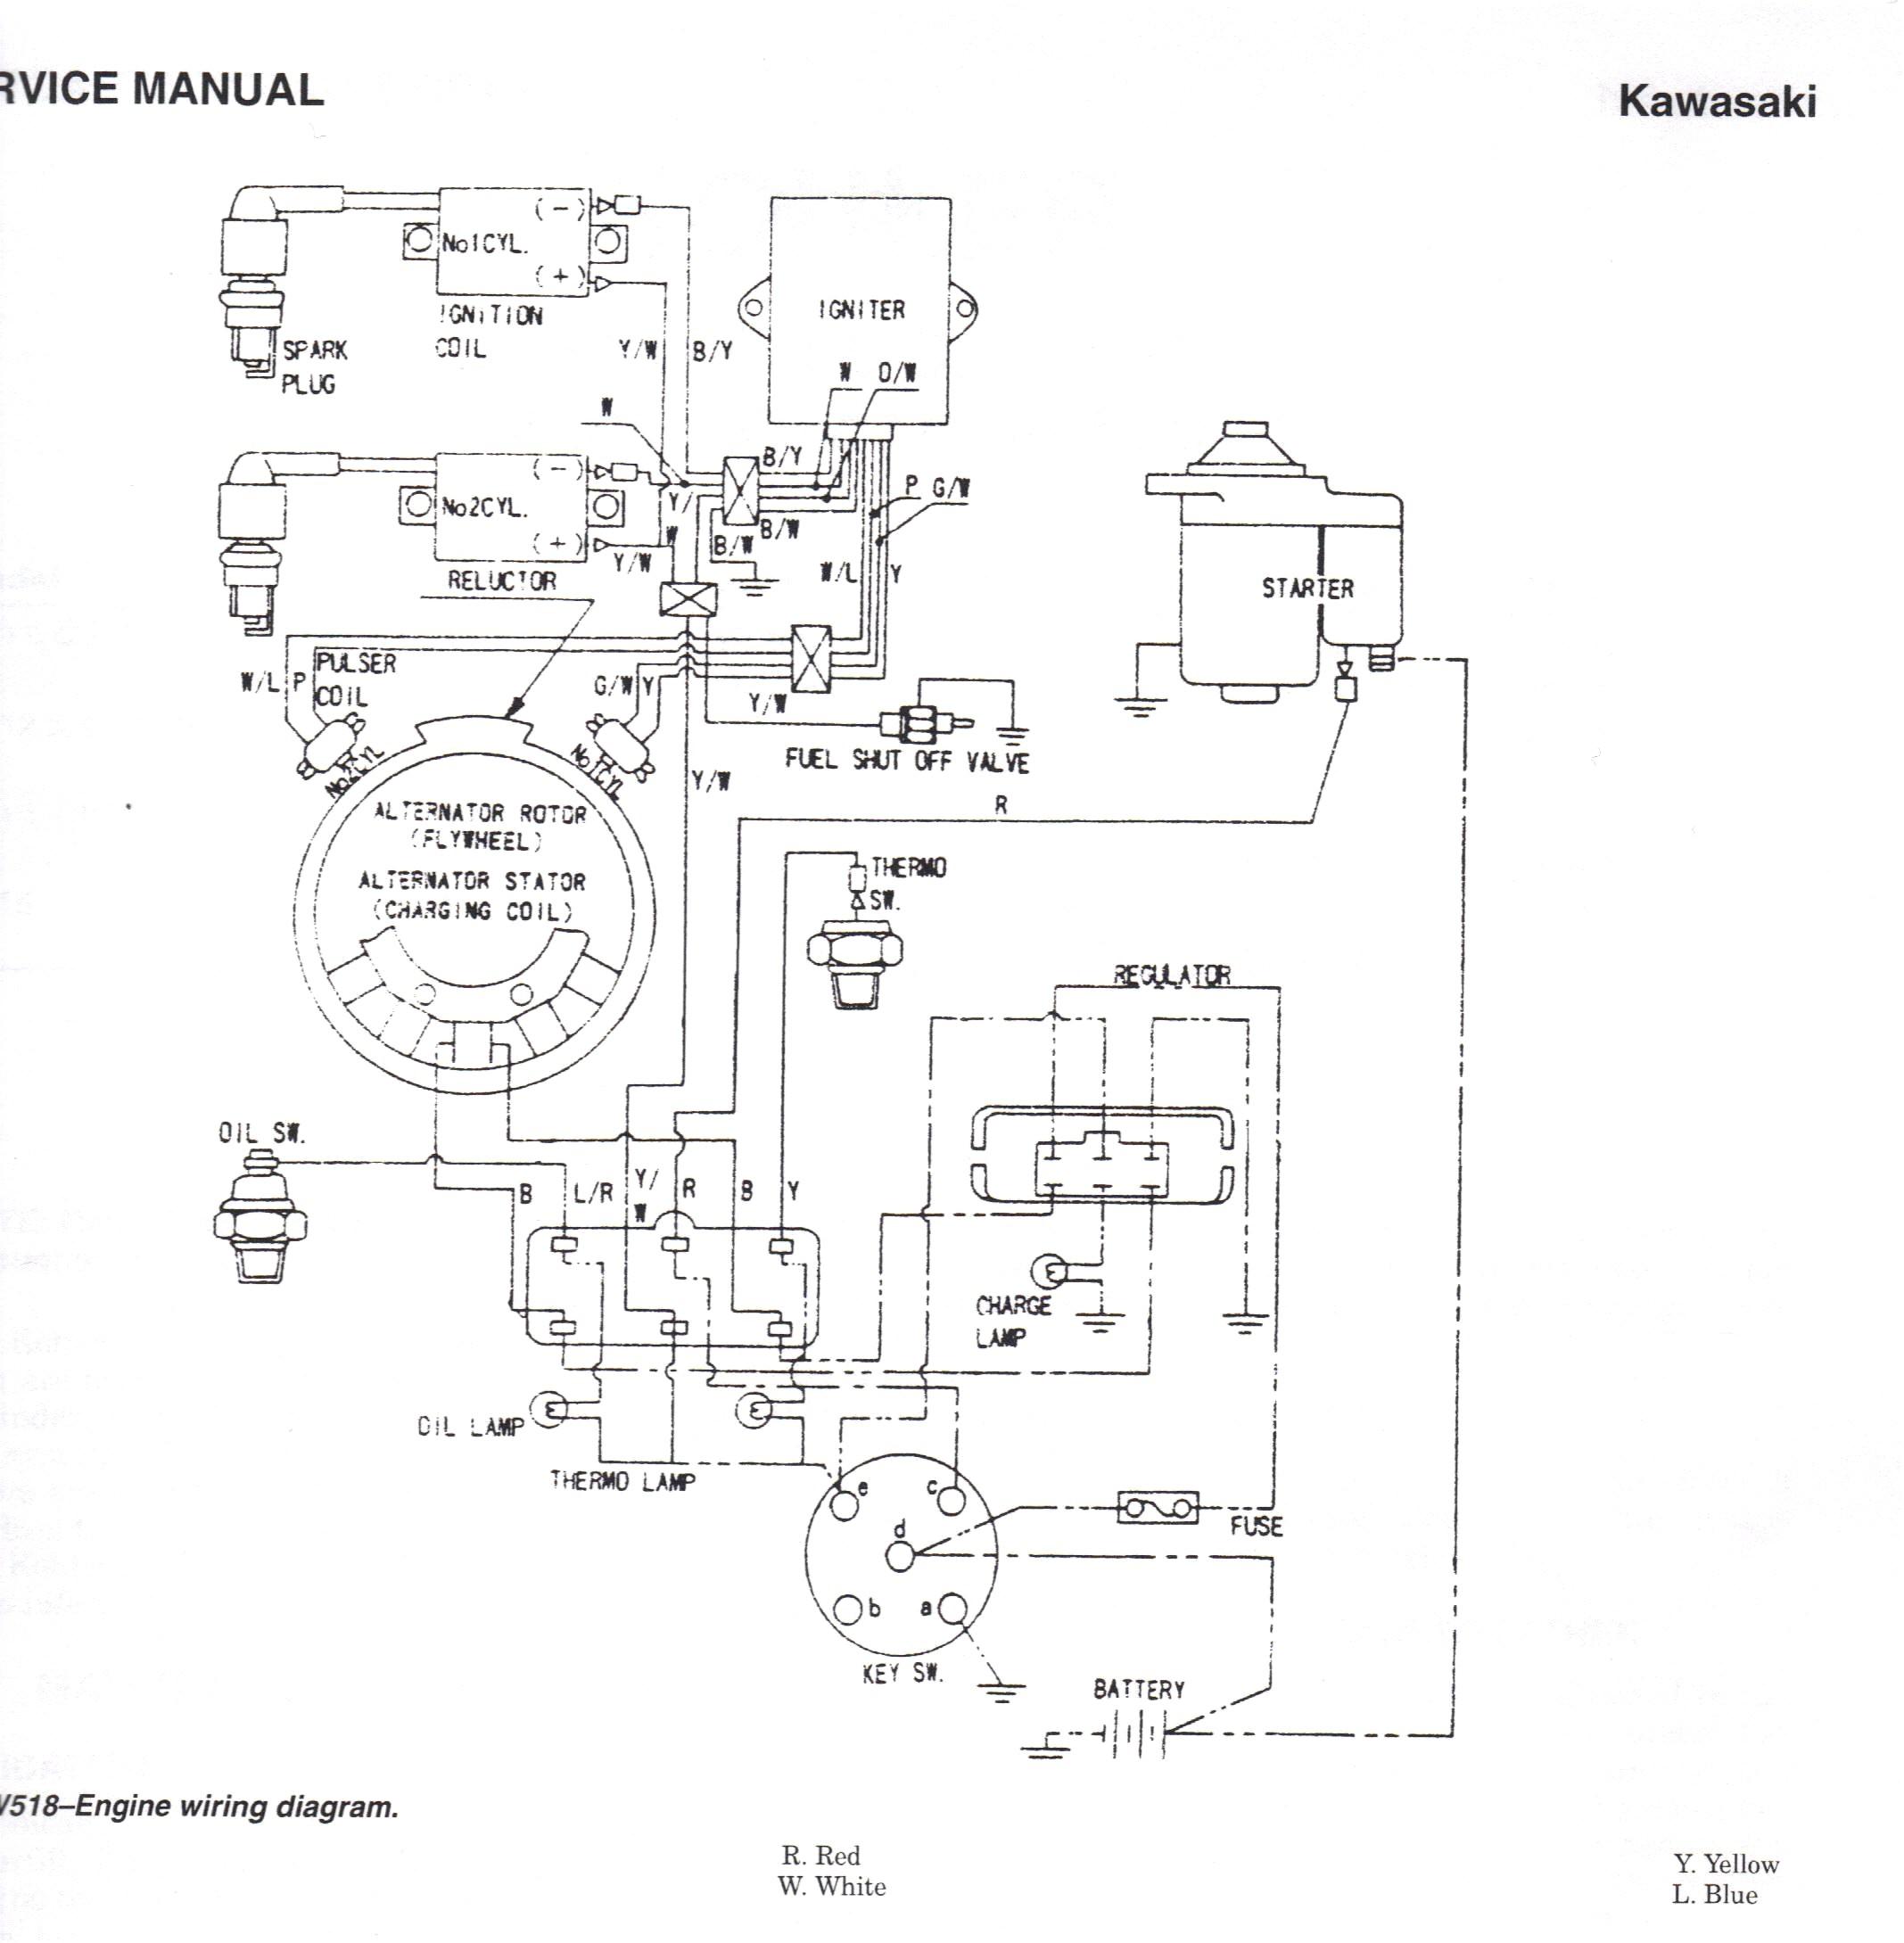 Jd 325 Wiring Schematic Circuit And Diagram Hub \u2022 John Deere 60 345:  Wiring